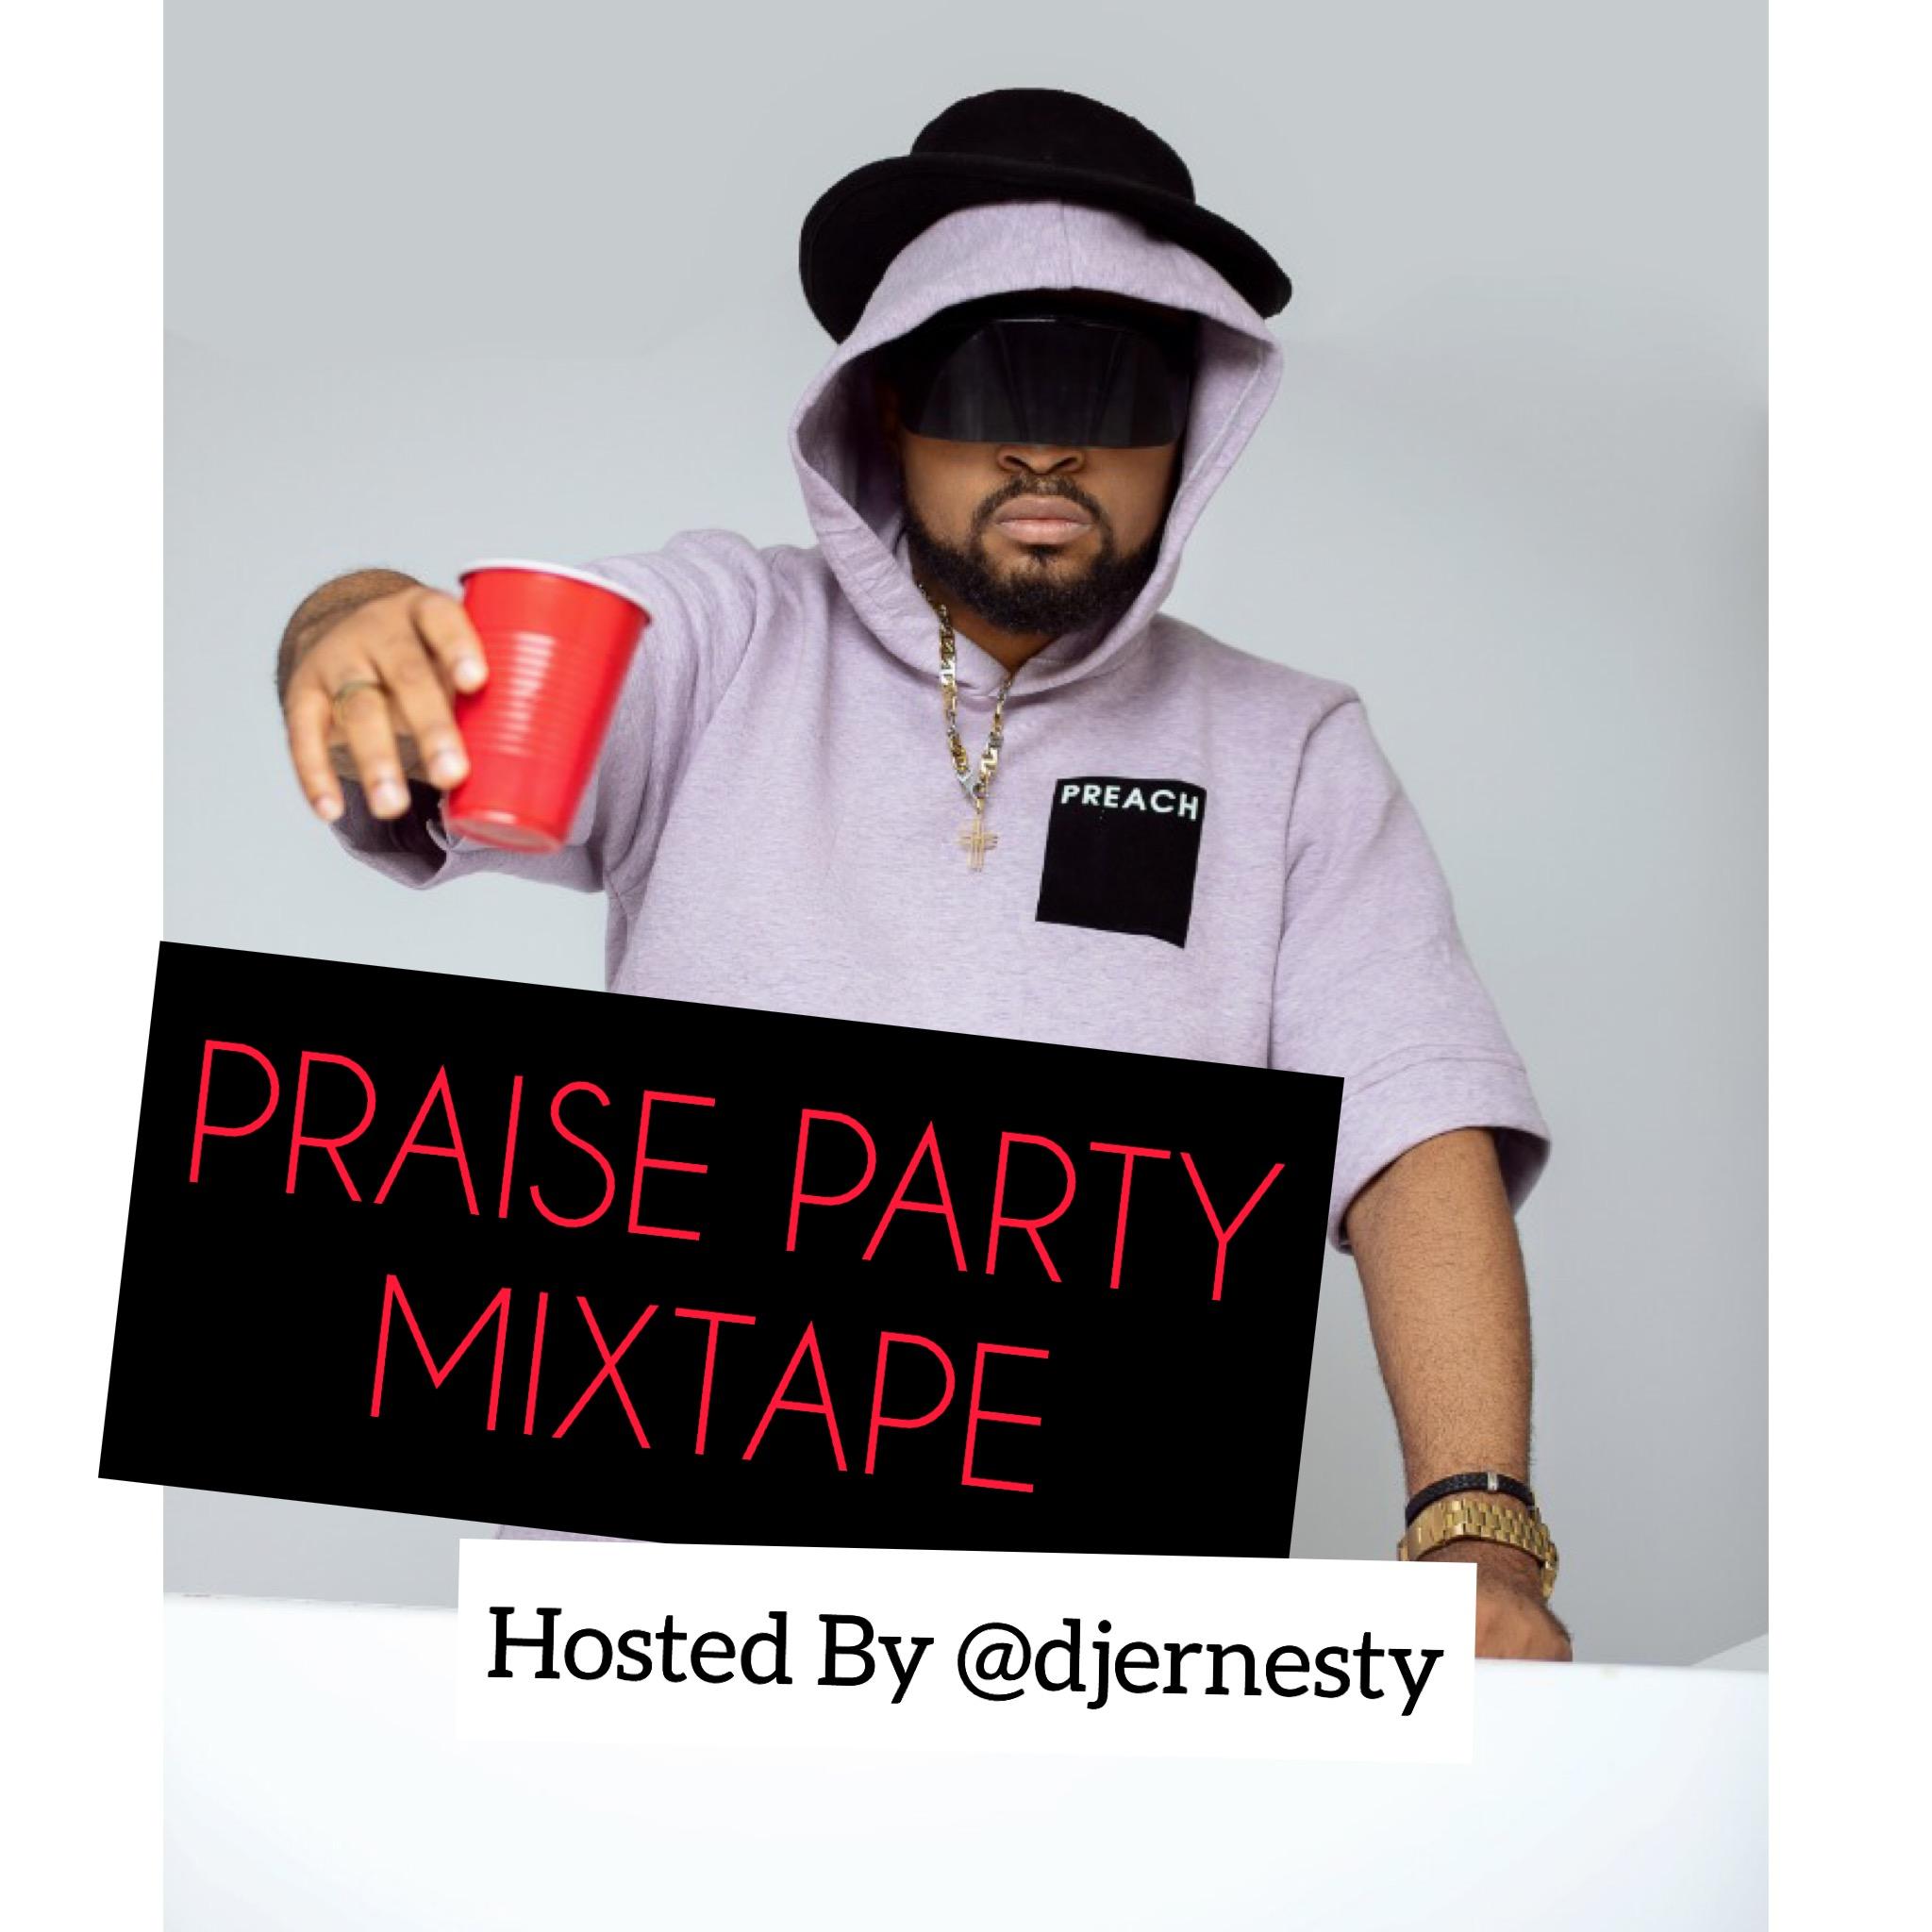 DJ ernesty Mix Image